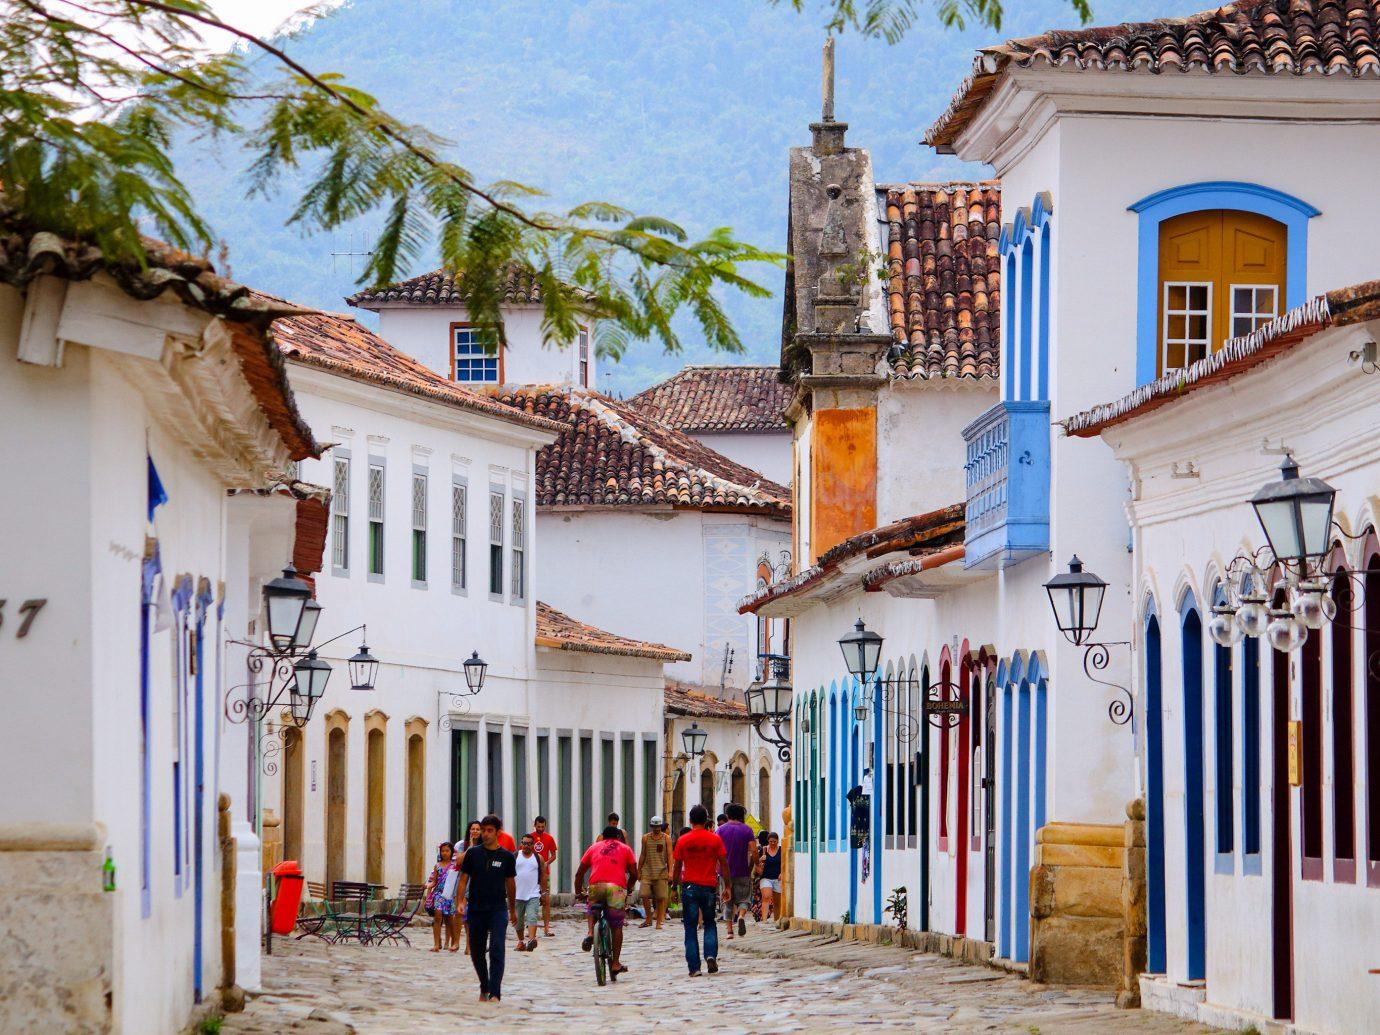 Beaches Brazil Trip Ideas building outdoor Town neighbourhood tourism facade street house City sky historic site window hacienda Village